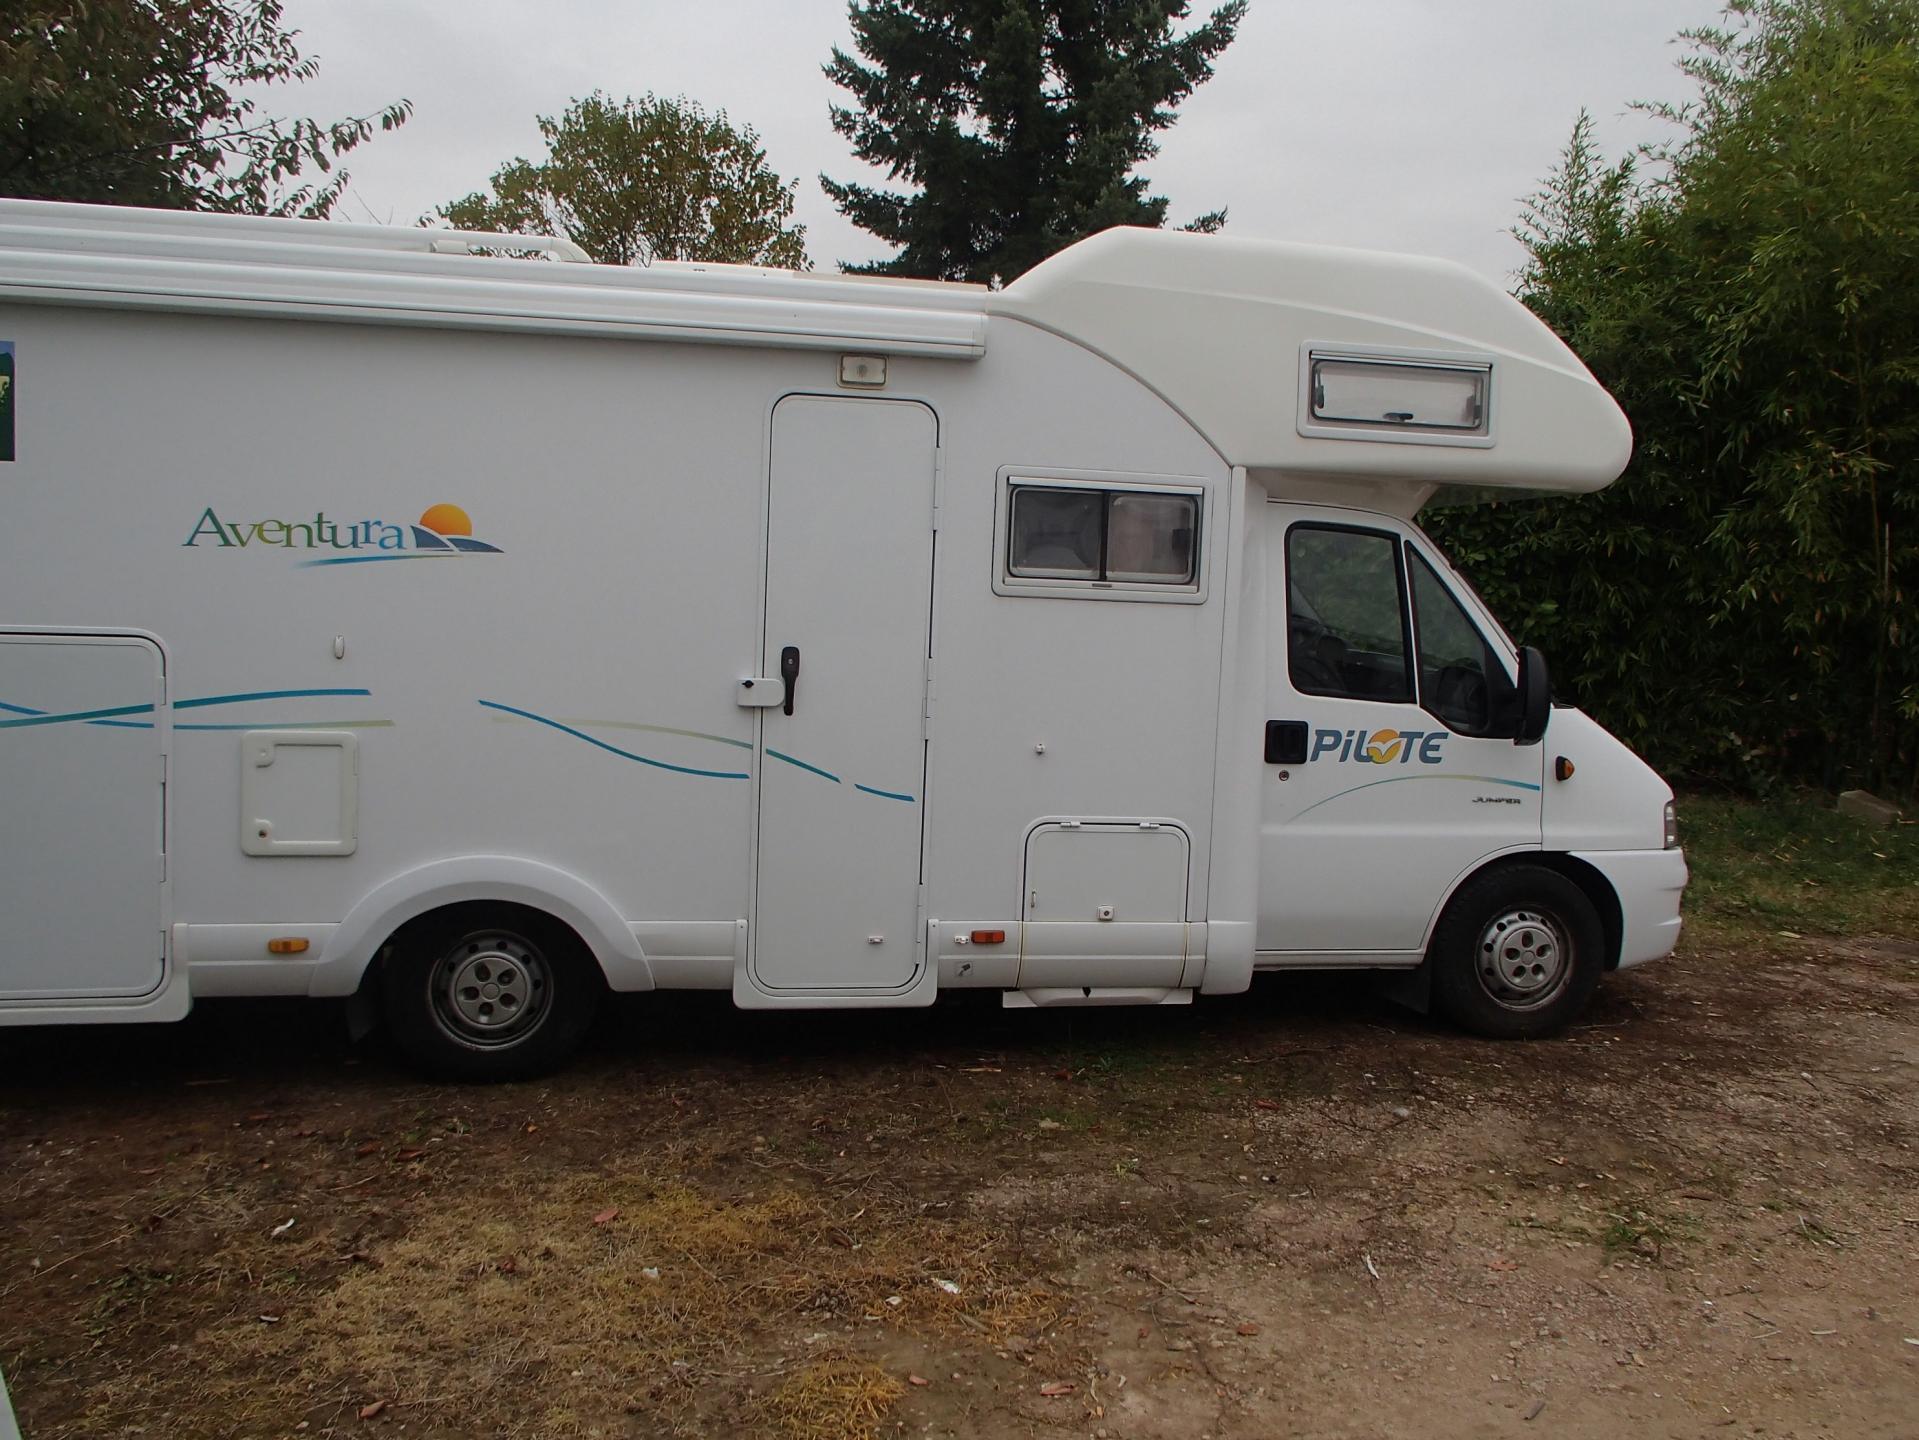 promo camping car pilote sur citroen 2 8l hdi occasion 25 900 euros. Black Bedroom Furniture Sets. Home Design Ideas